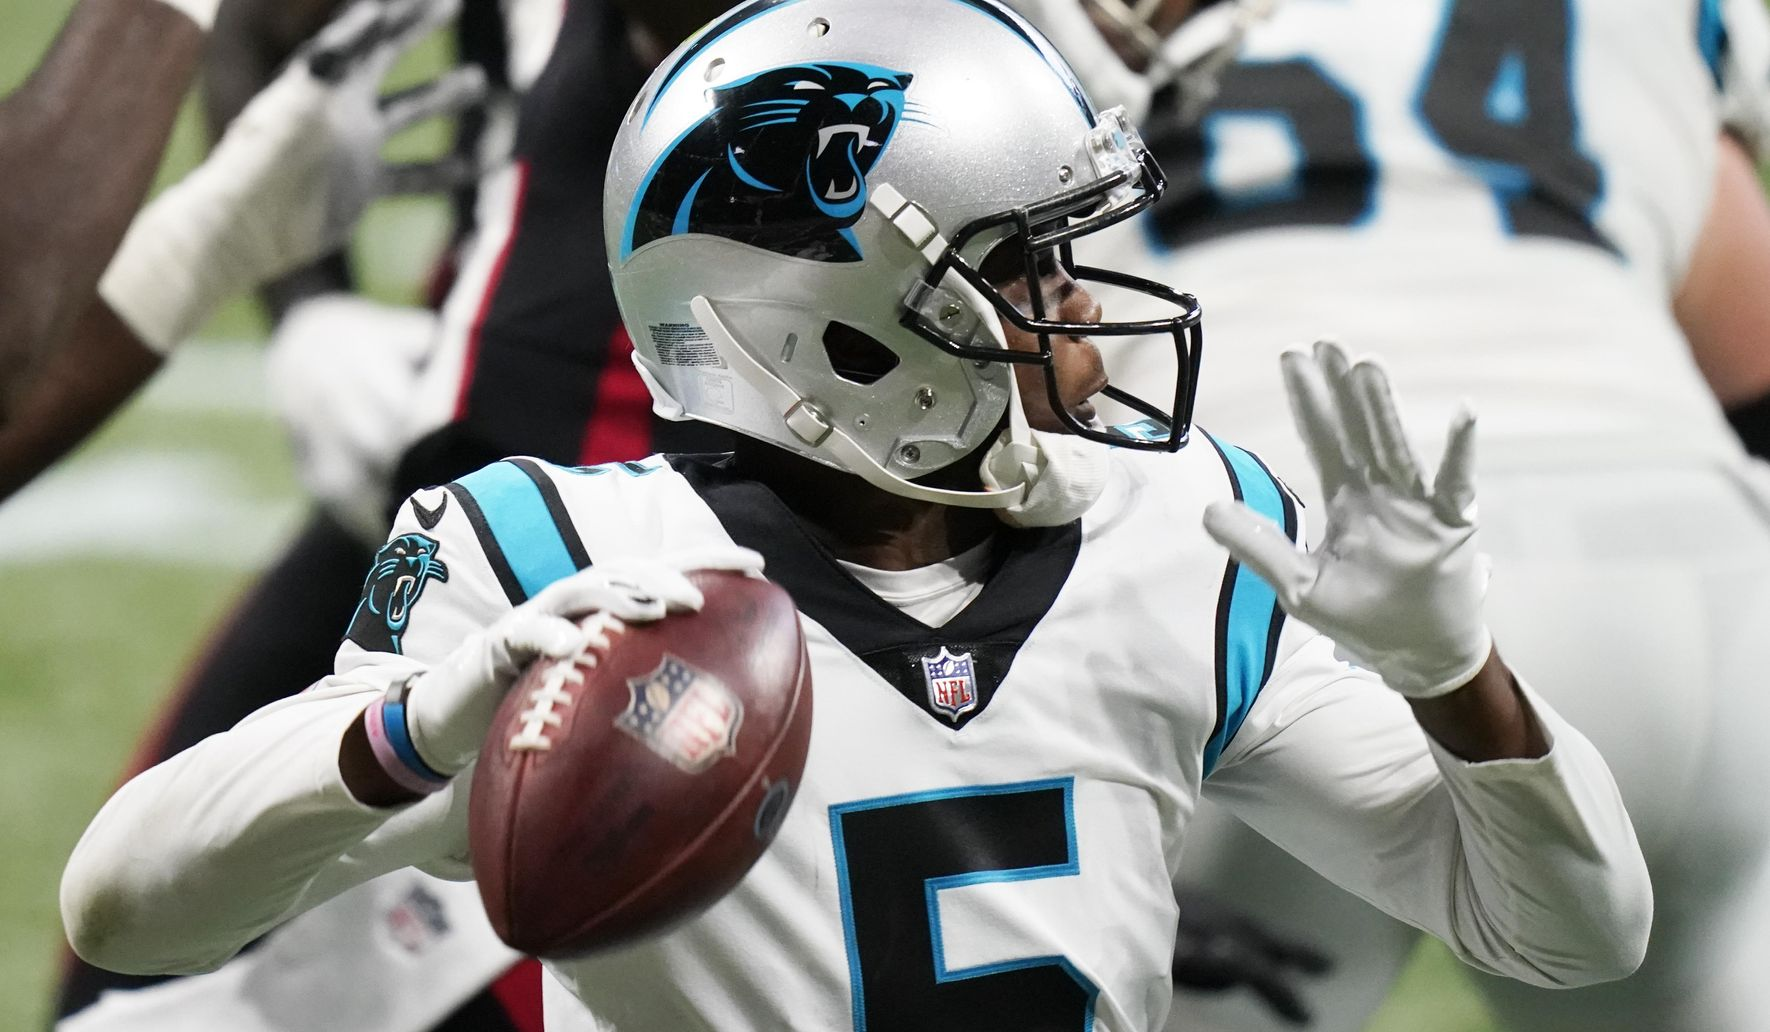 Panthers_falcons_football_54999_c0-196-4694-2932_s1770x1032